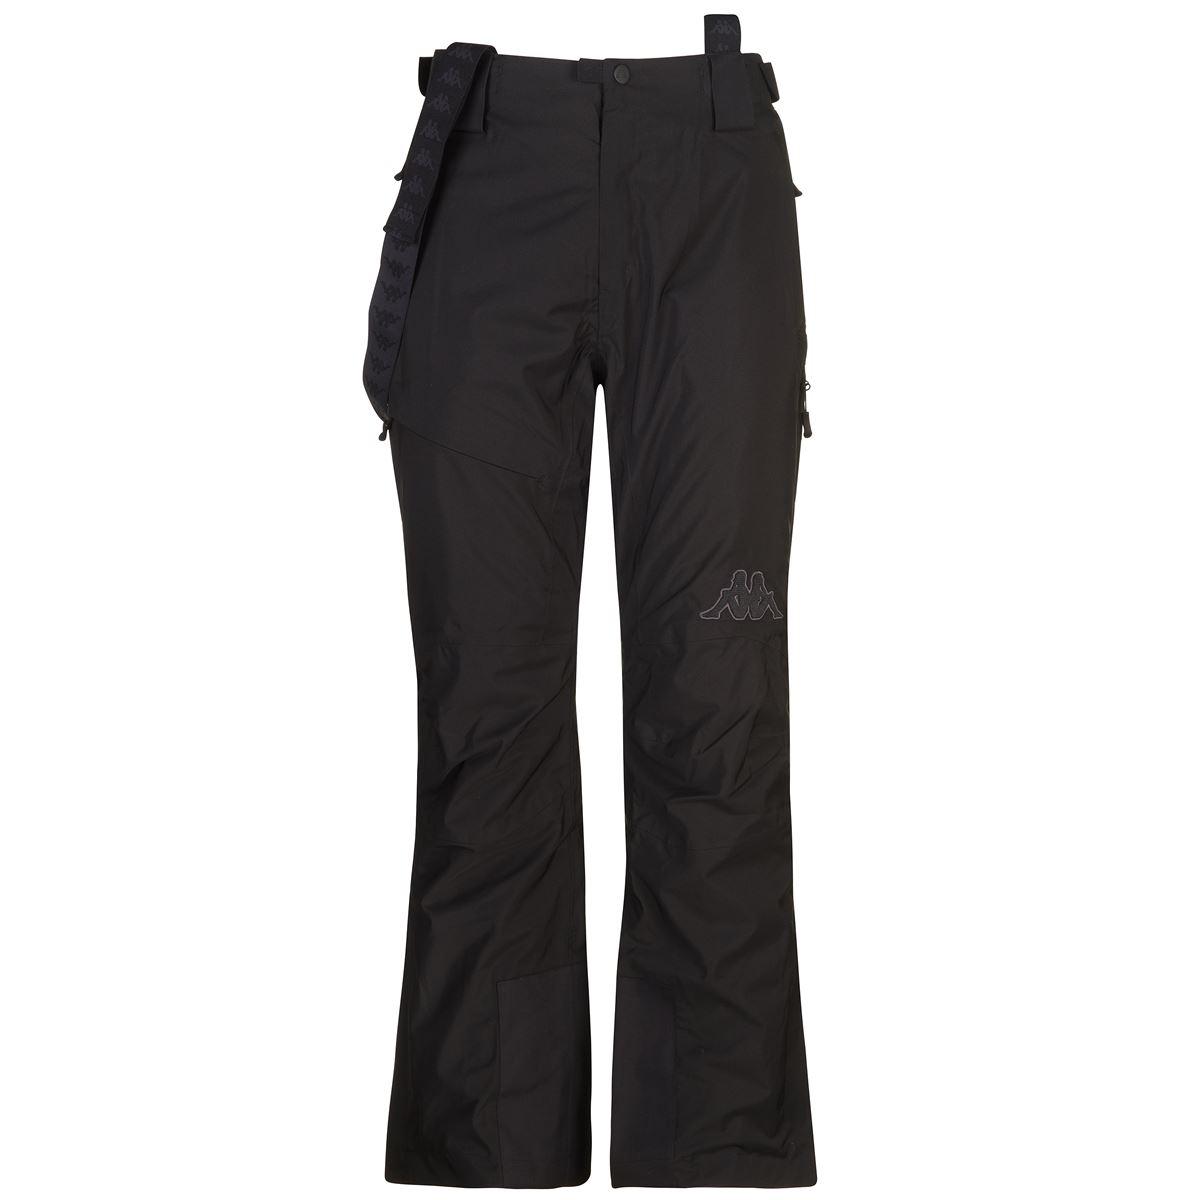 Kappa Pantaloni uomo-36136FW